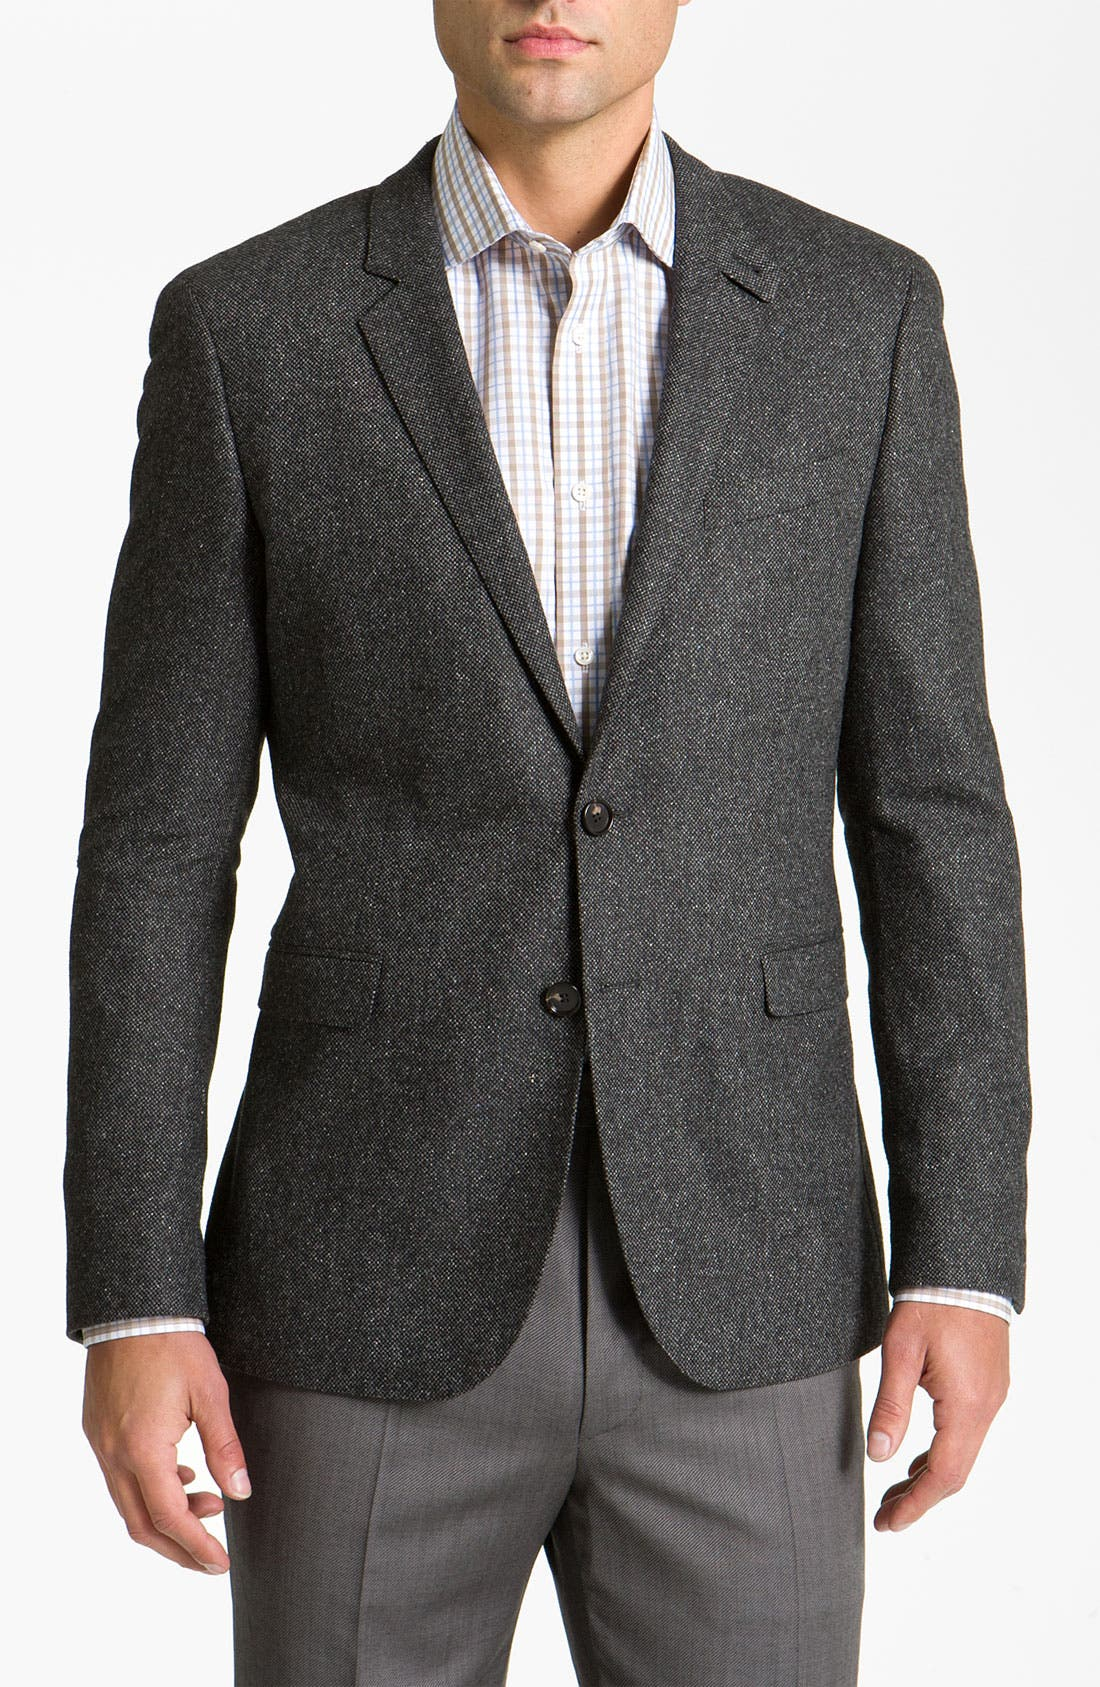 Alternate Image 1 Selected - BOSS Black 'Rhett' Extra Trim Fit Tweed Sportcoat